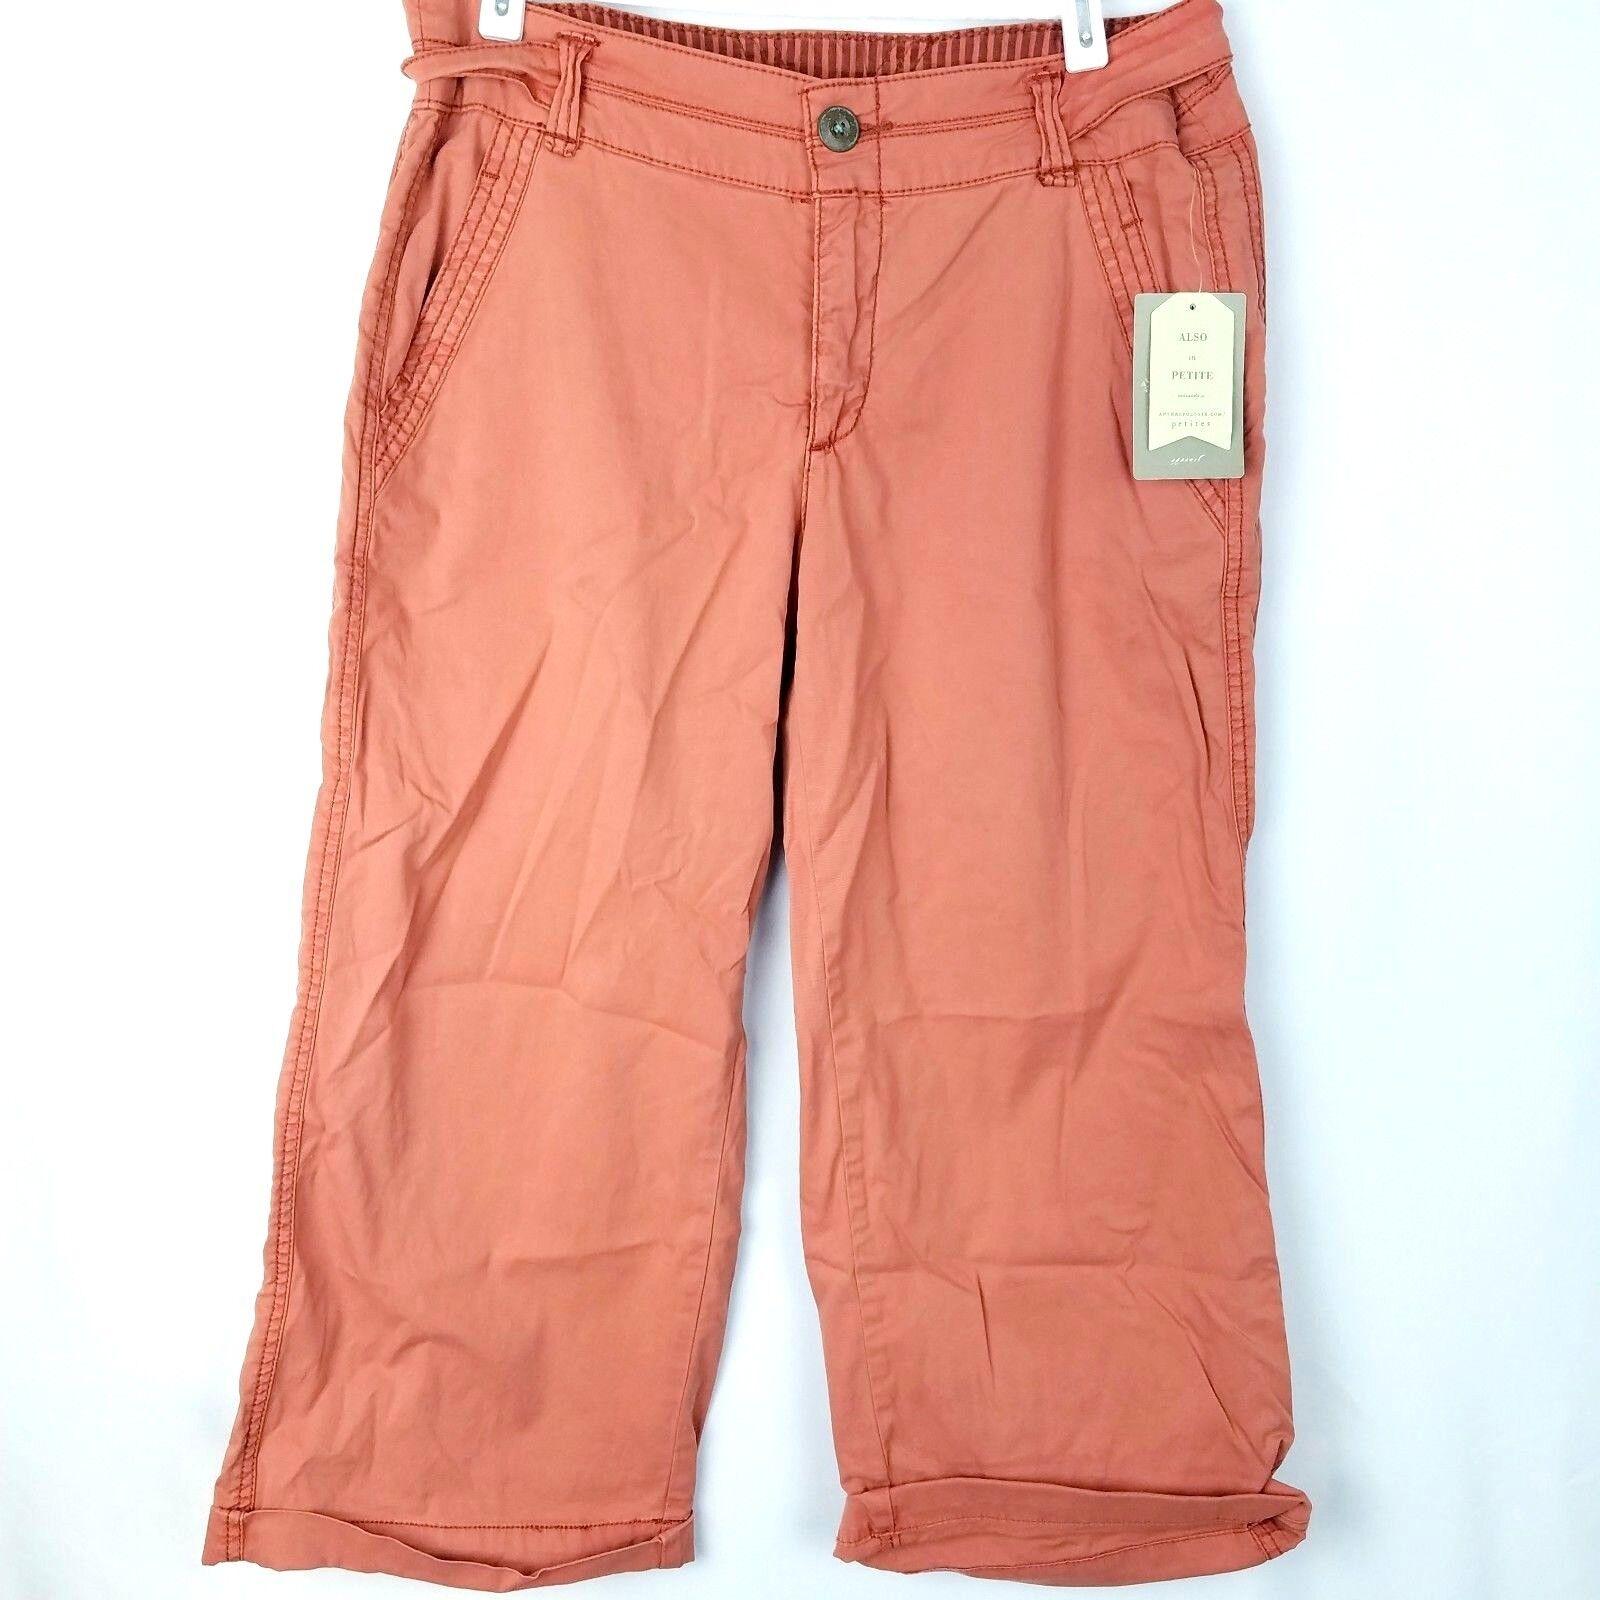 Hei Anthropologie Capri Pants damen Größe 27 Orange Mid-Calf Length Salmon  118